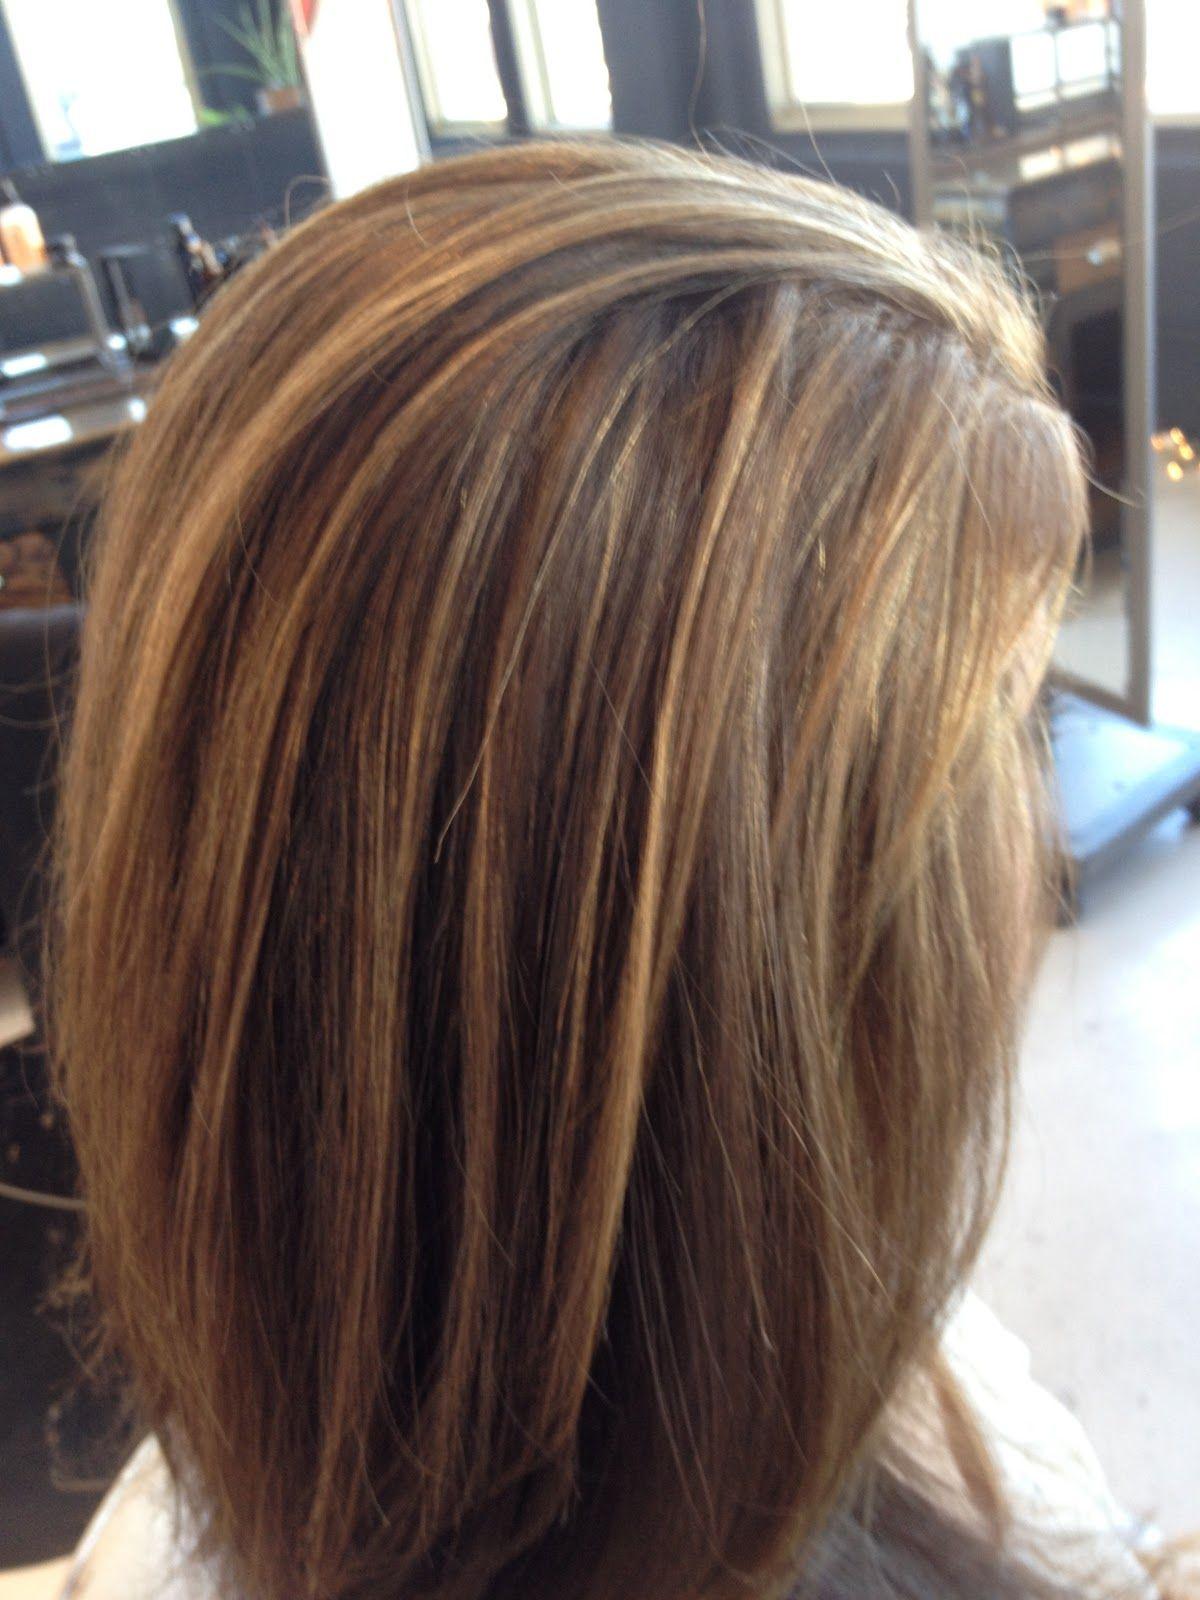 Caramel Highlights Brown Hair Tumblr 2 My Style